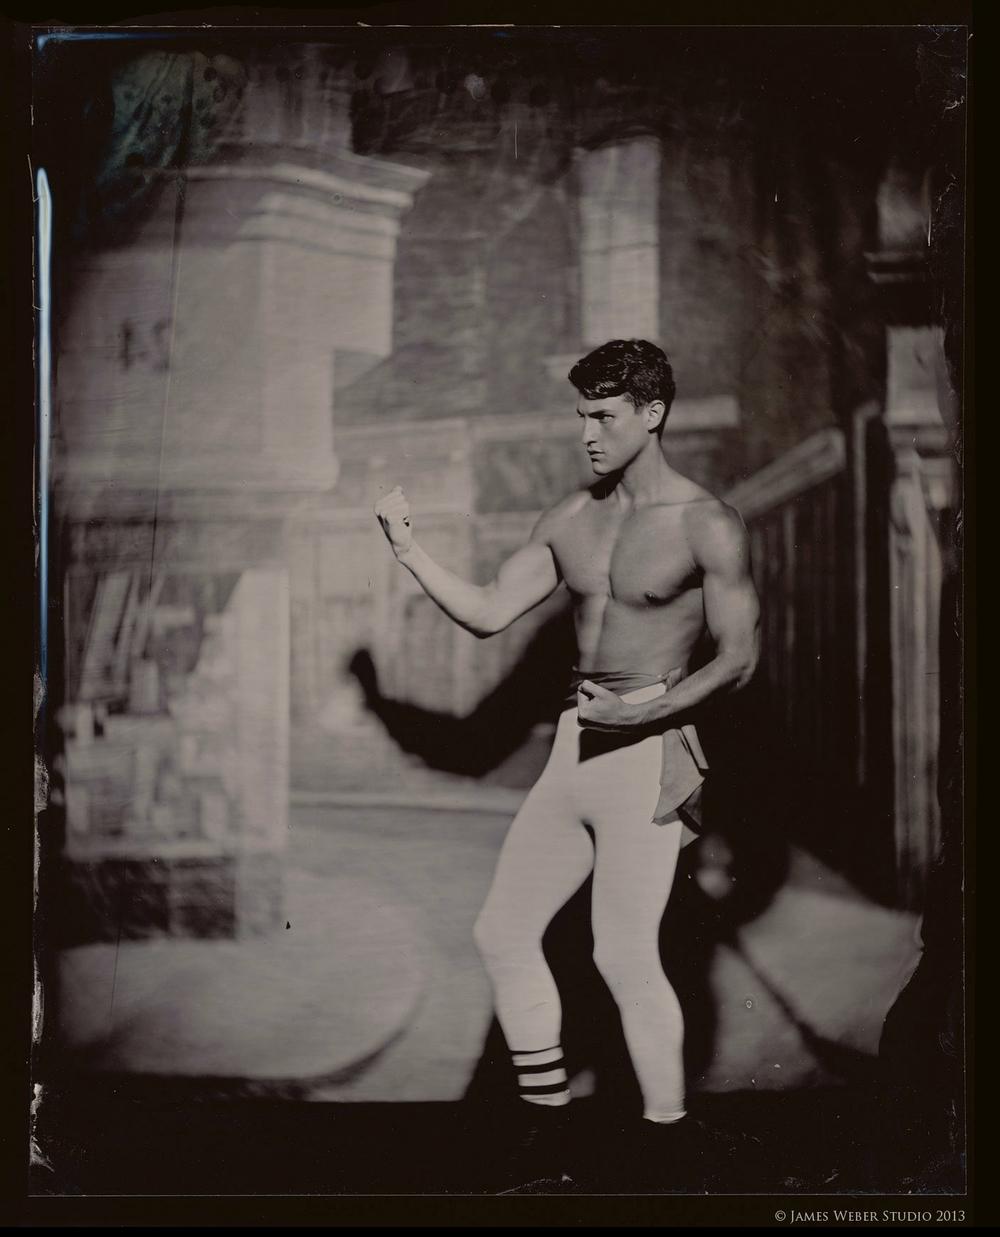 Model: Jordan @ Red NYC Tights by Capezio, Socks, Courtesy of Joan Goldberg